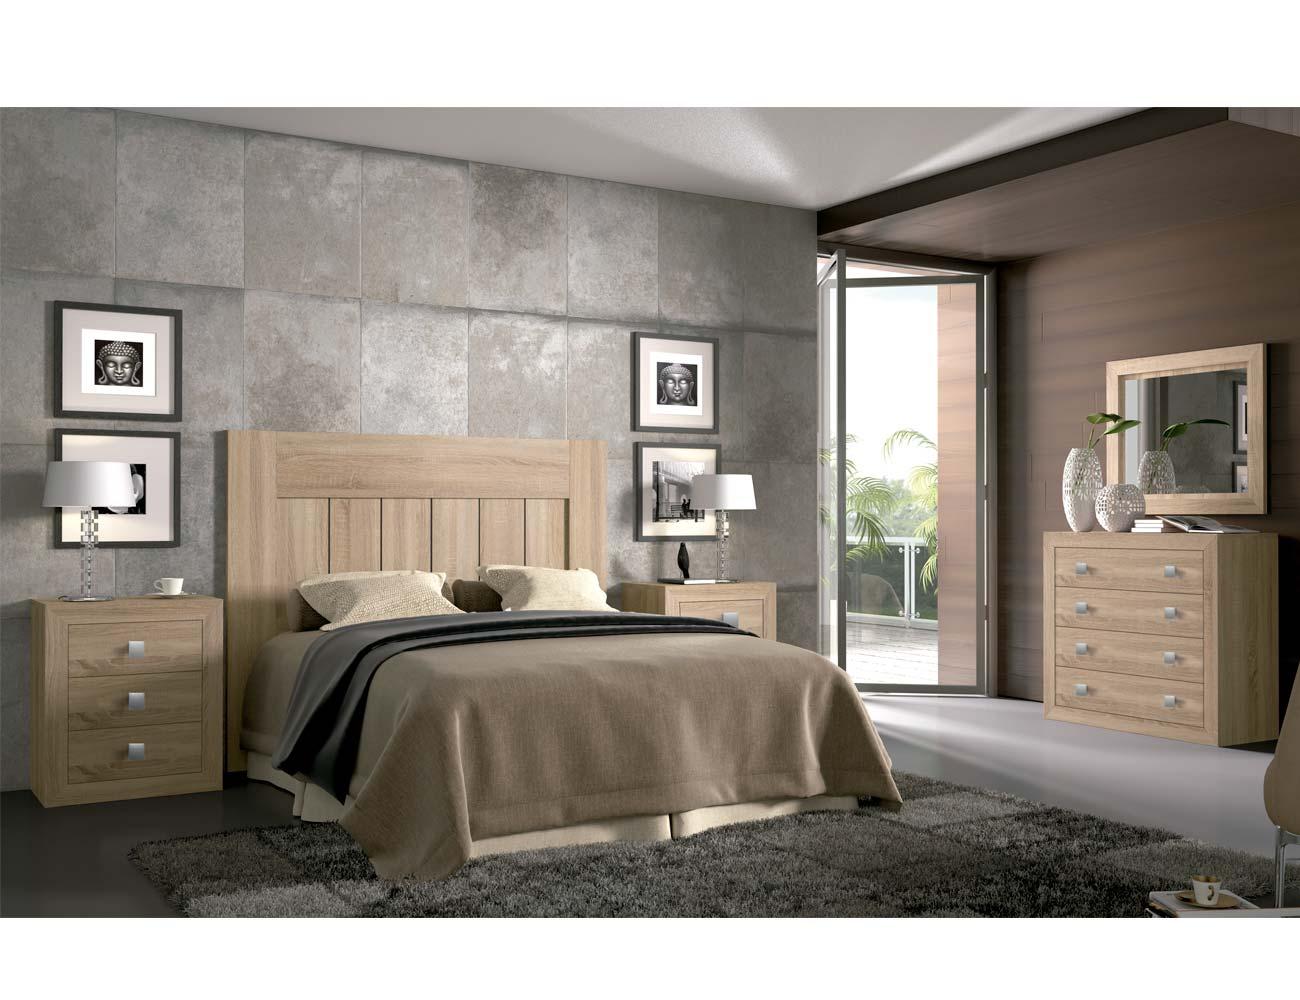 Dormitorio matrimonio moderno 06 cambrian